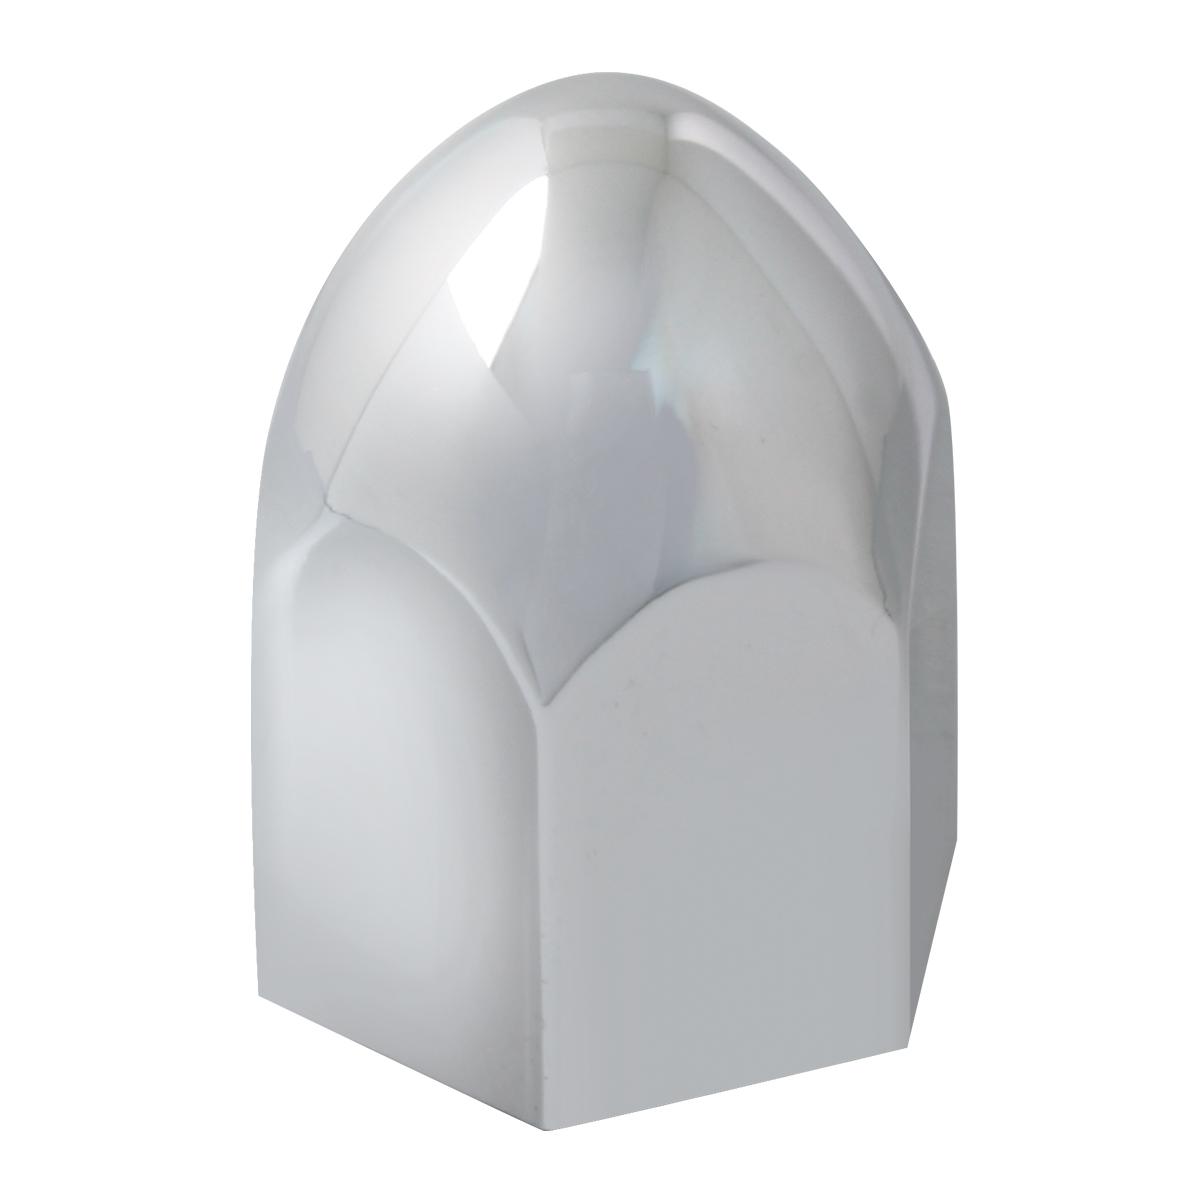 GG Grand General 52009 Chrome Plastic Ashtray Cover for Pete 06+